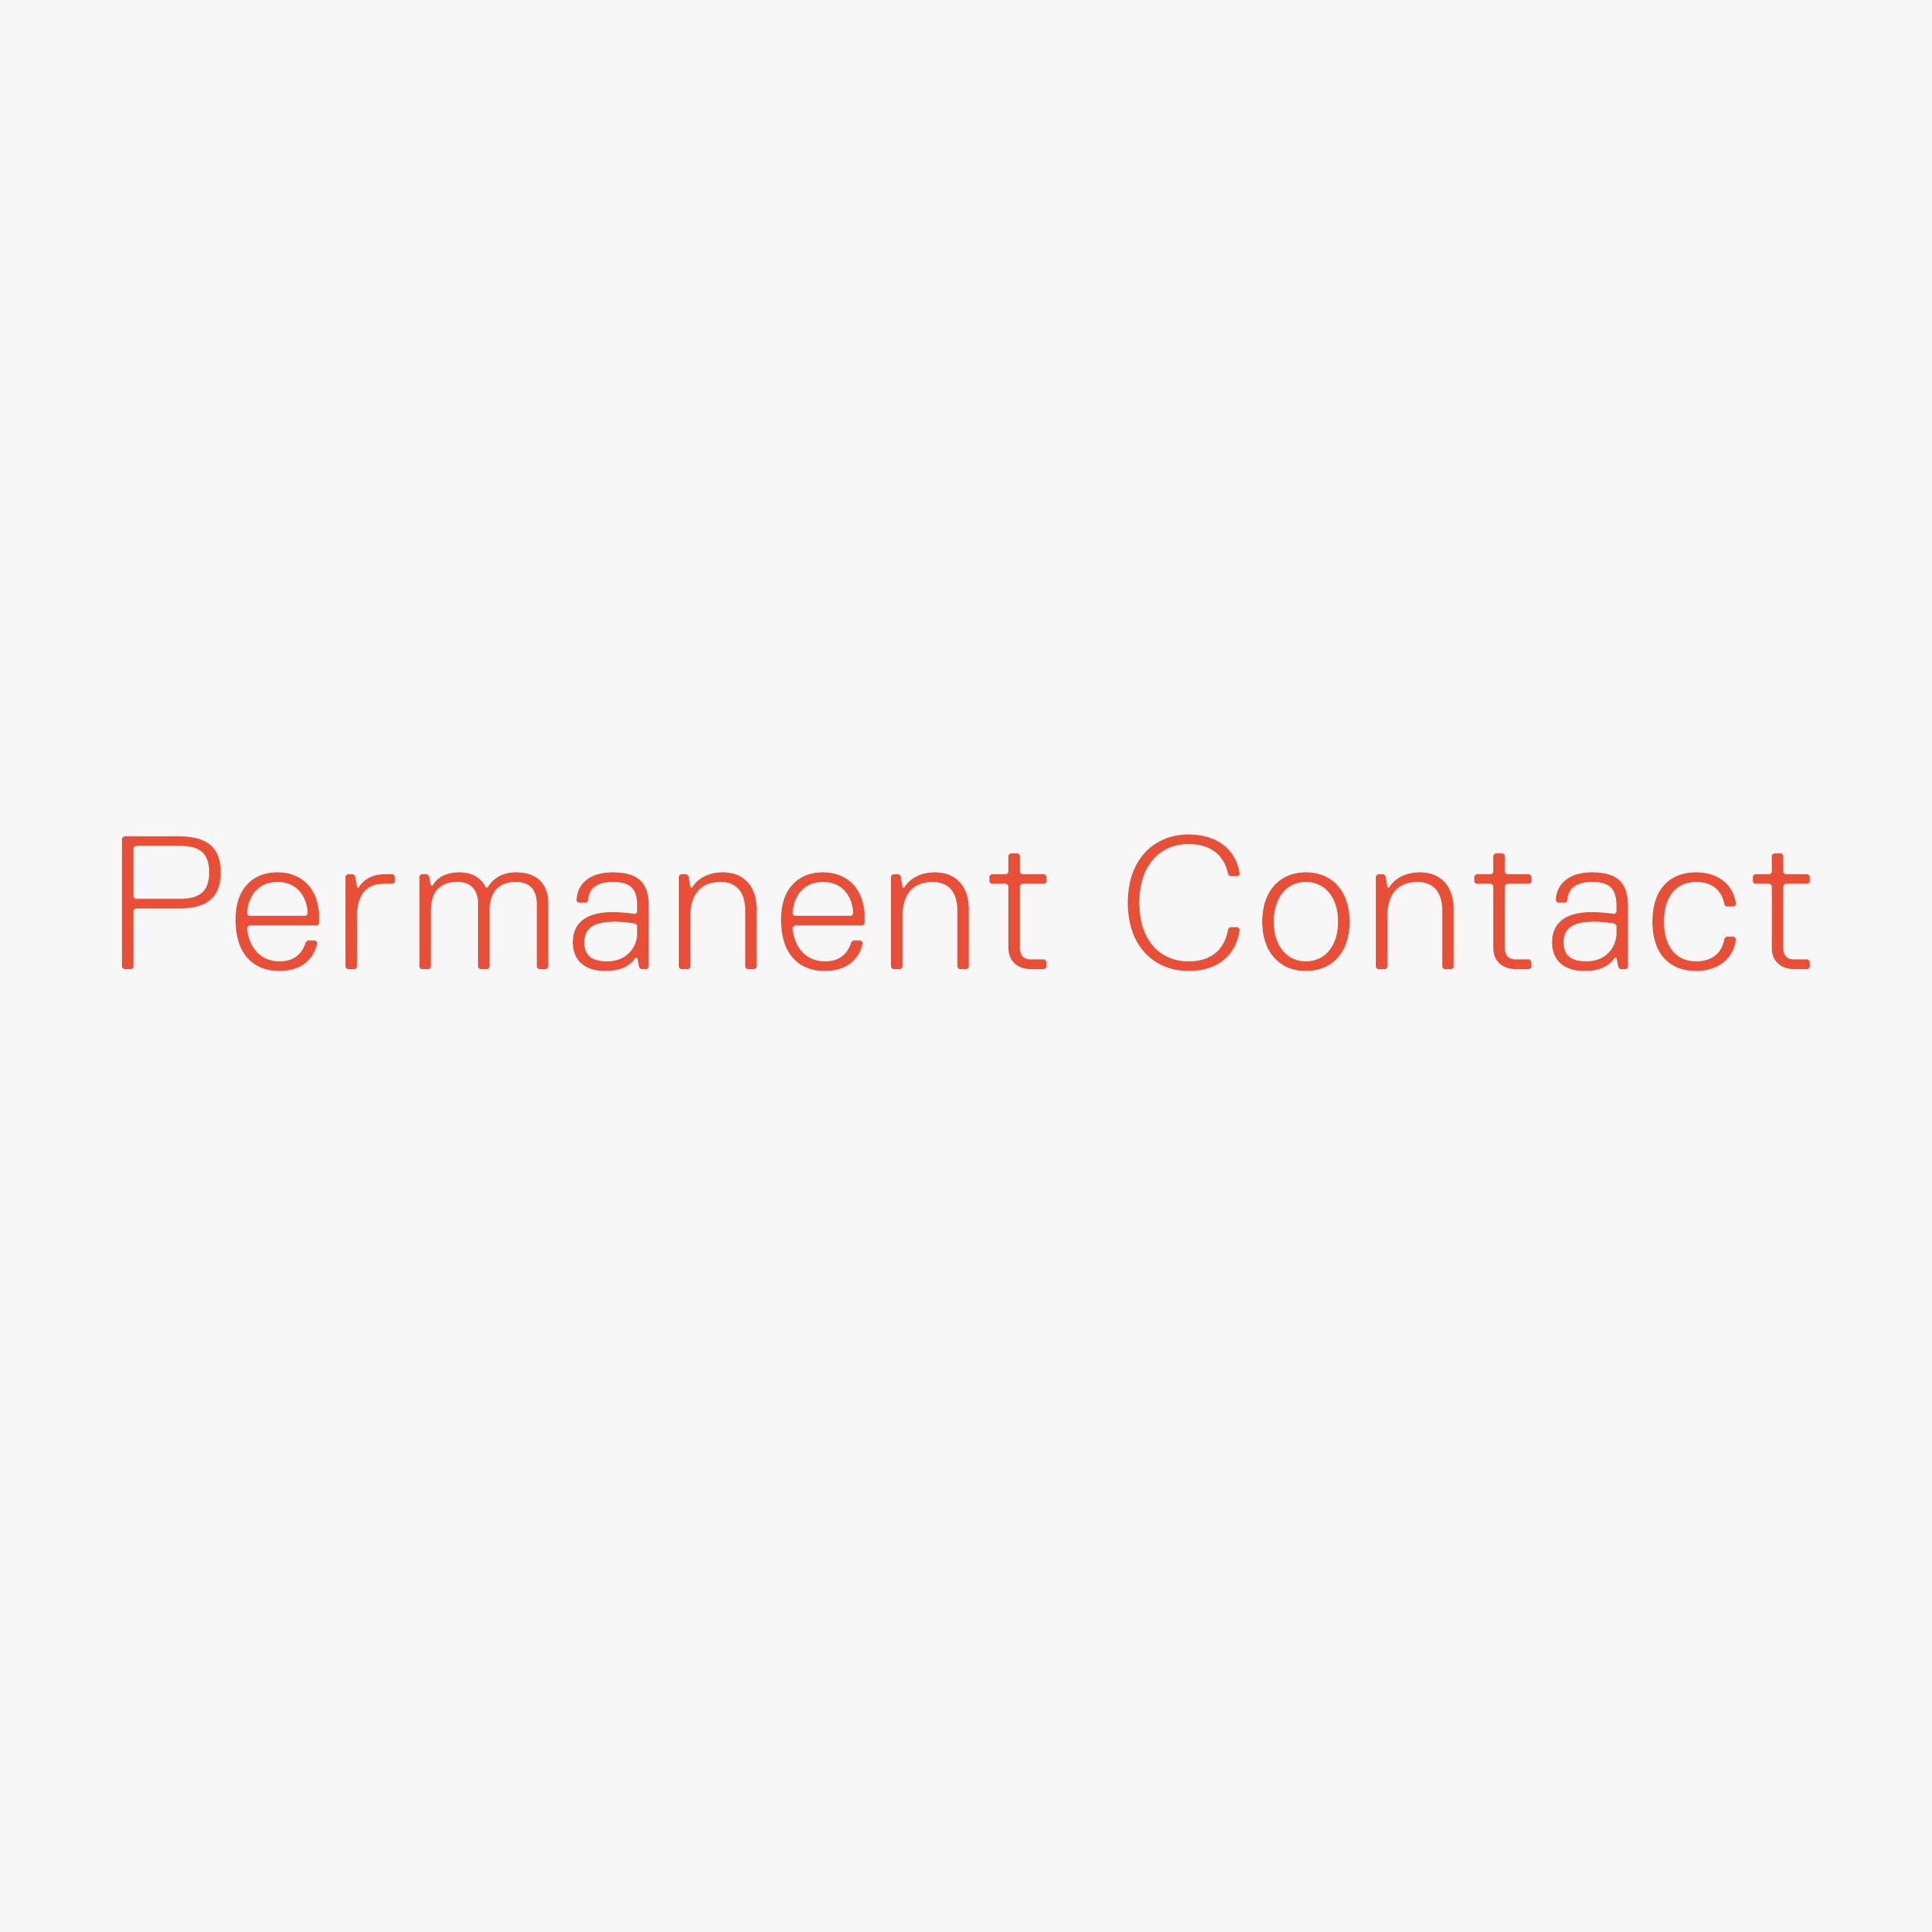 Permanent Contact Mech No Name